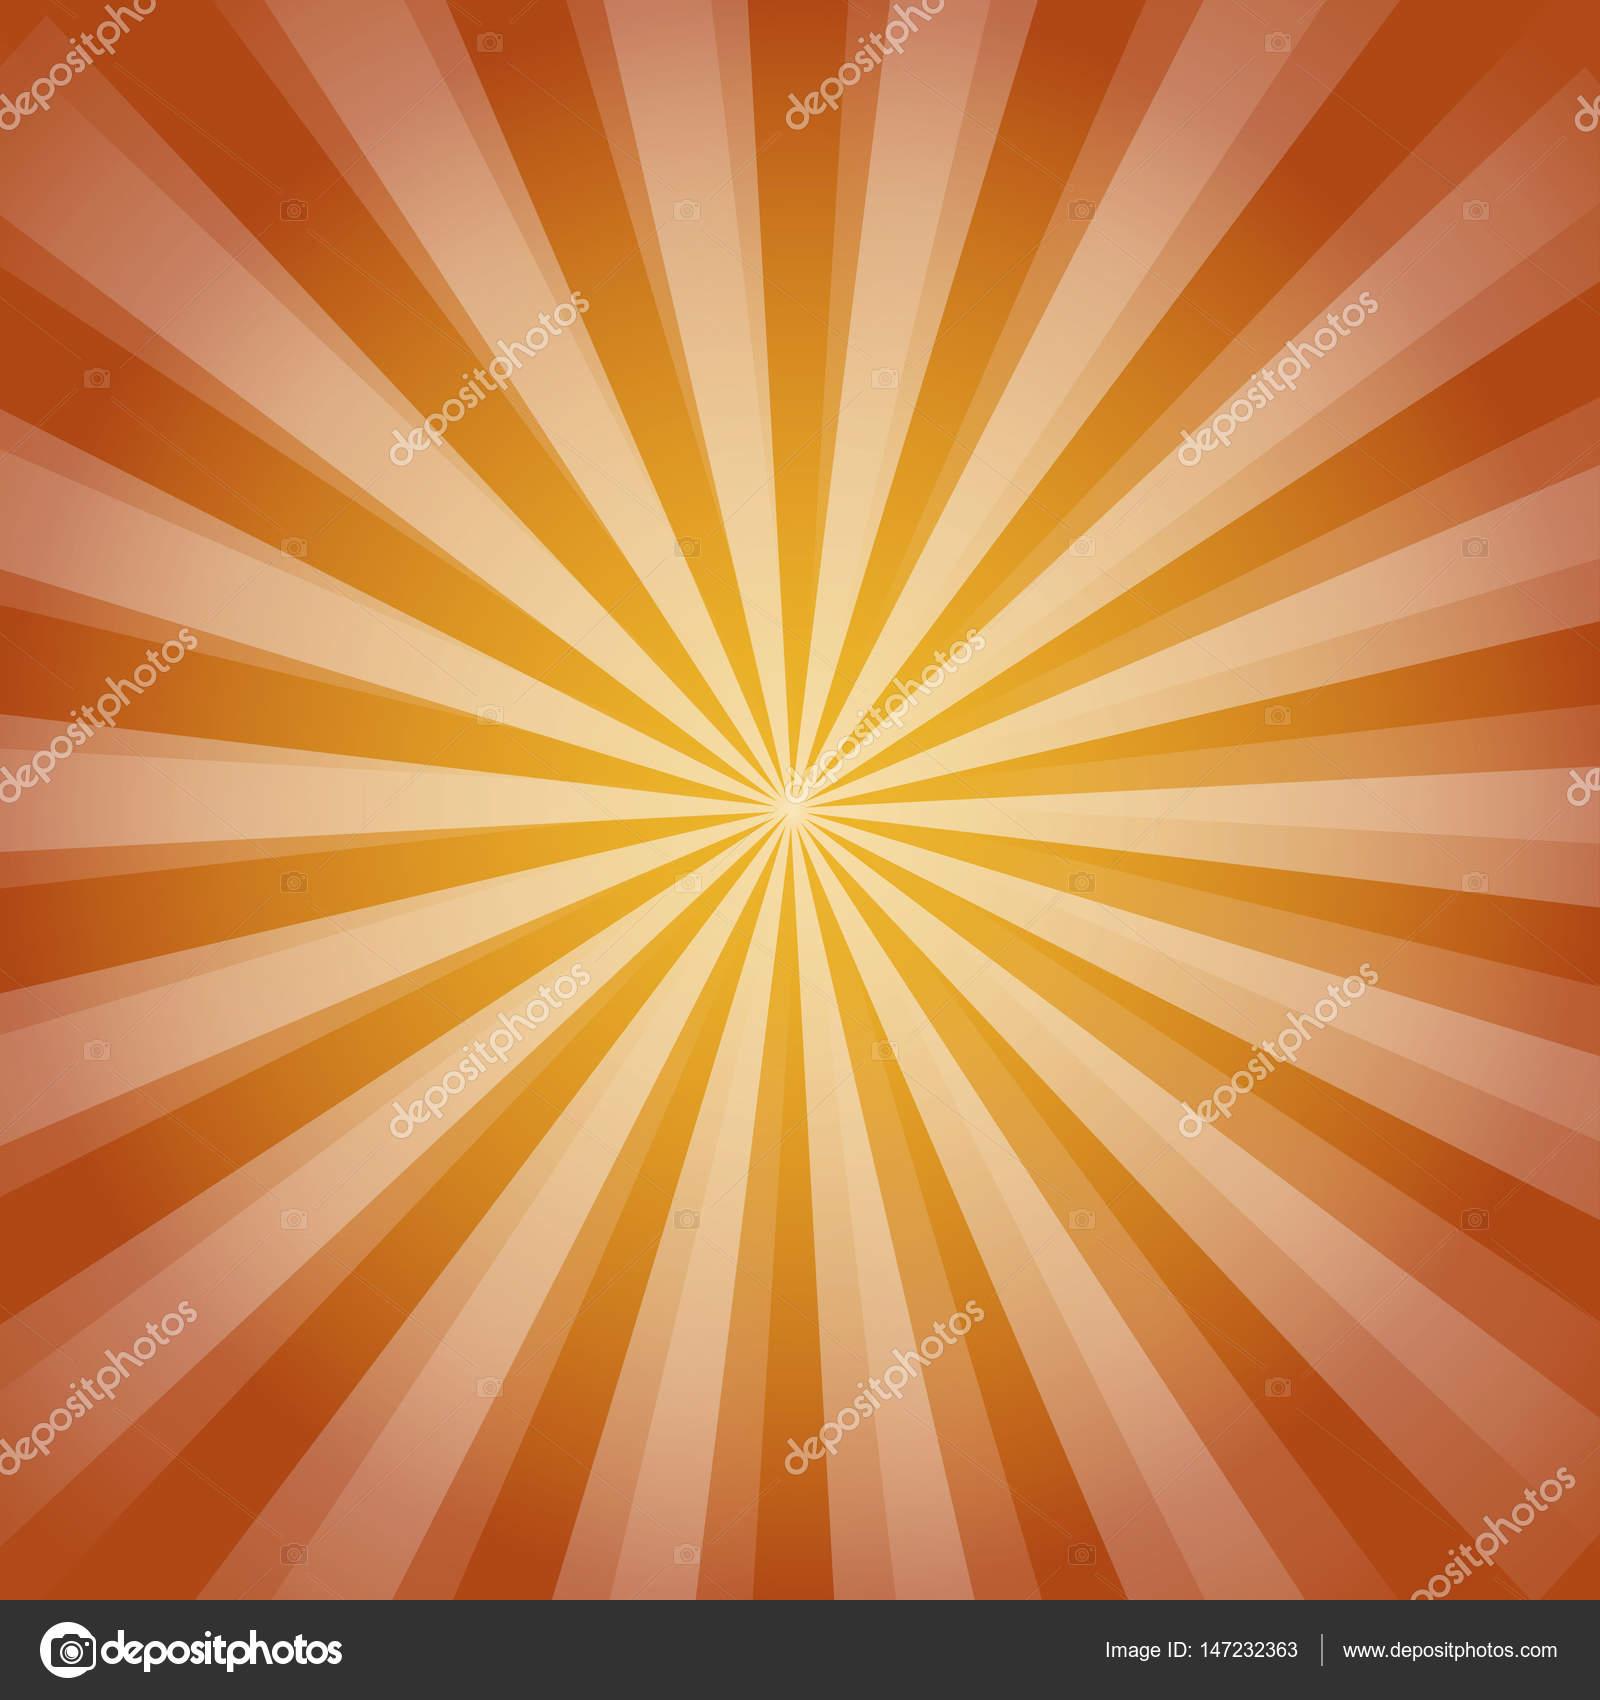 8725ac5f1ef Shiny sun ray background. Sun Sunburst Pattern. orange rays summer ...